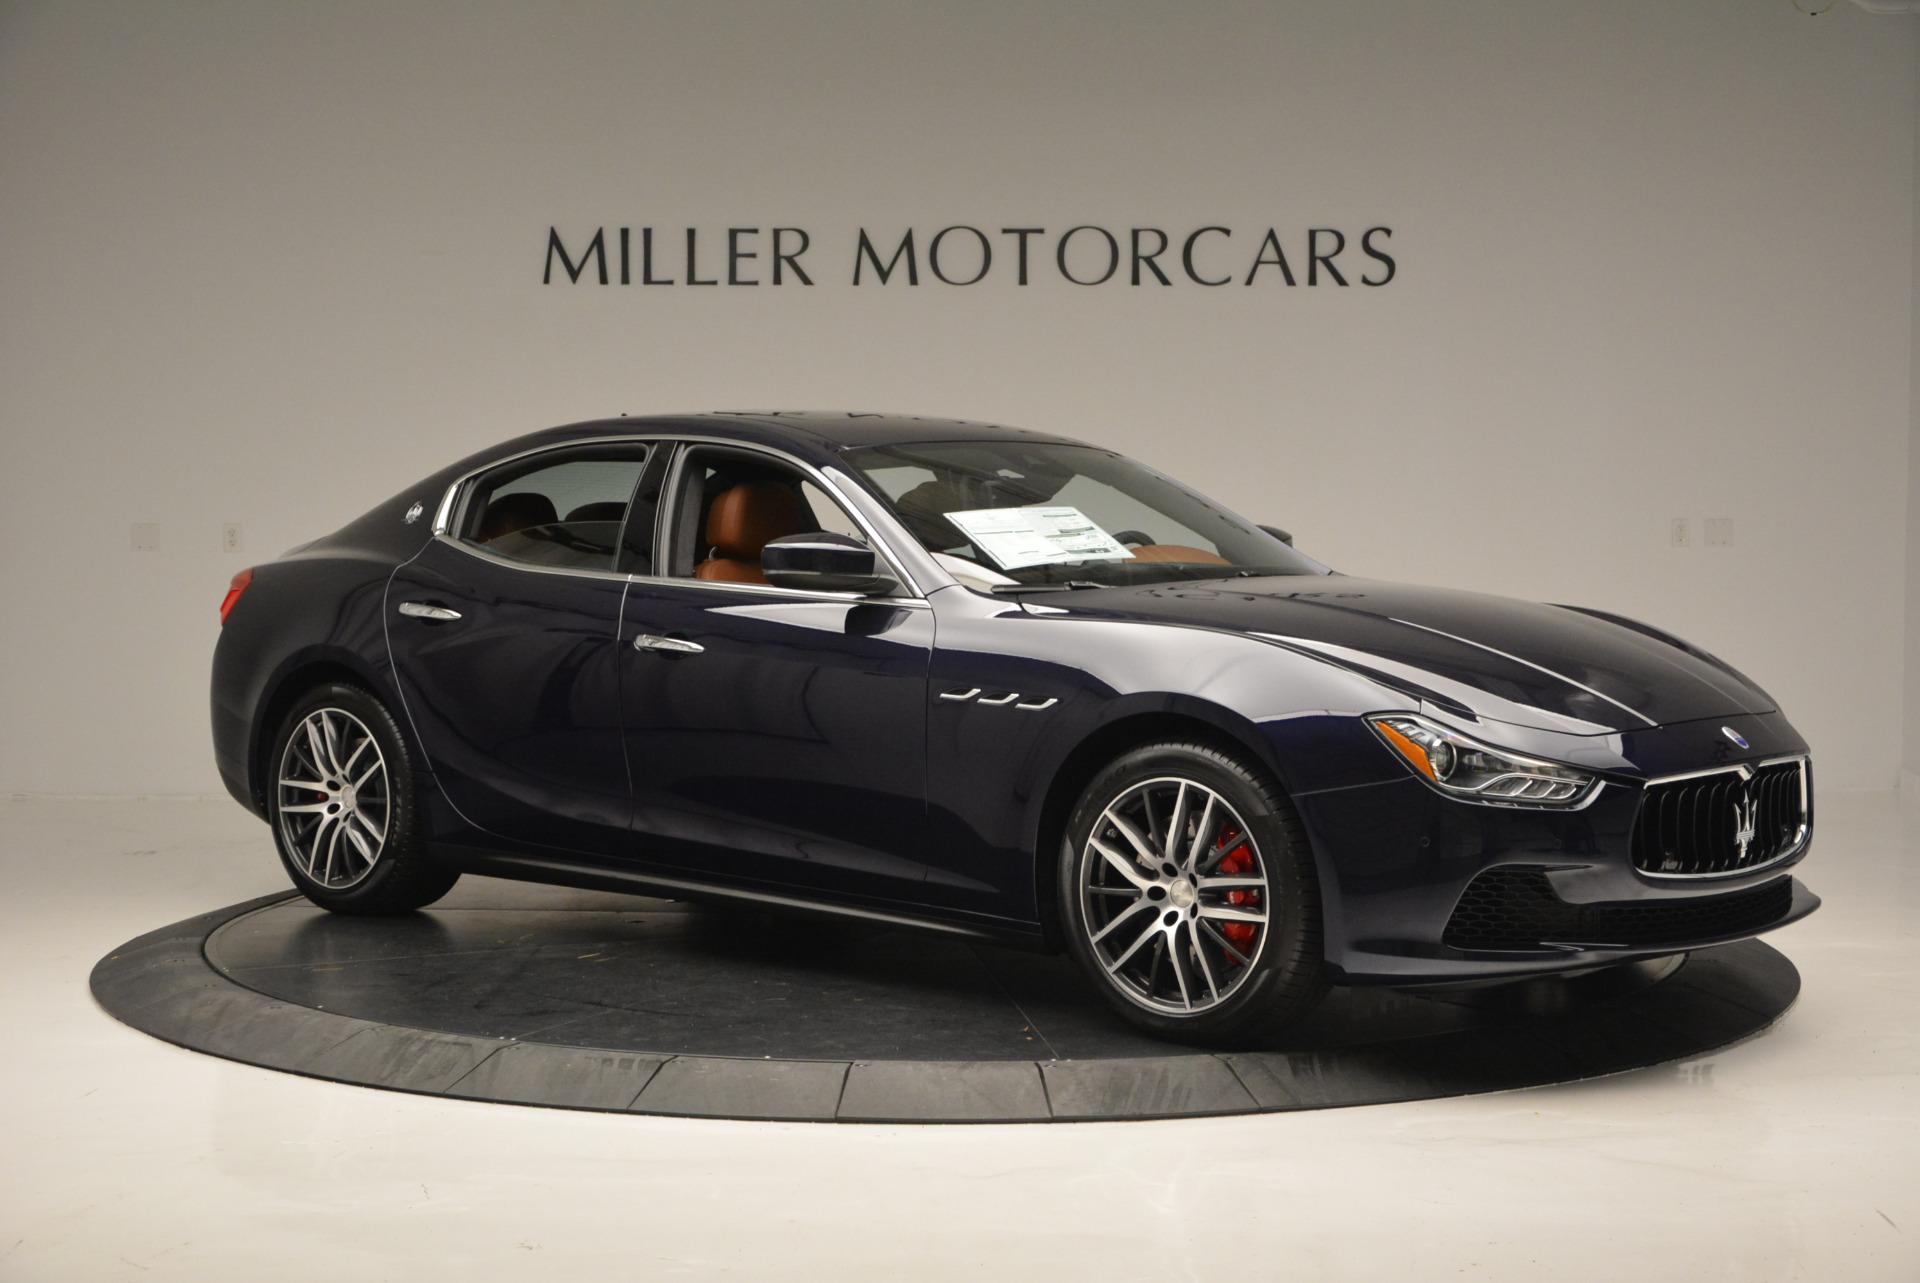 Used 2017 Maserati Ghibli S Q4 - EX Loaner For Sale In Greenwich, CT 568_p10